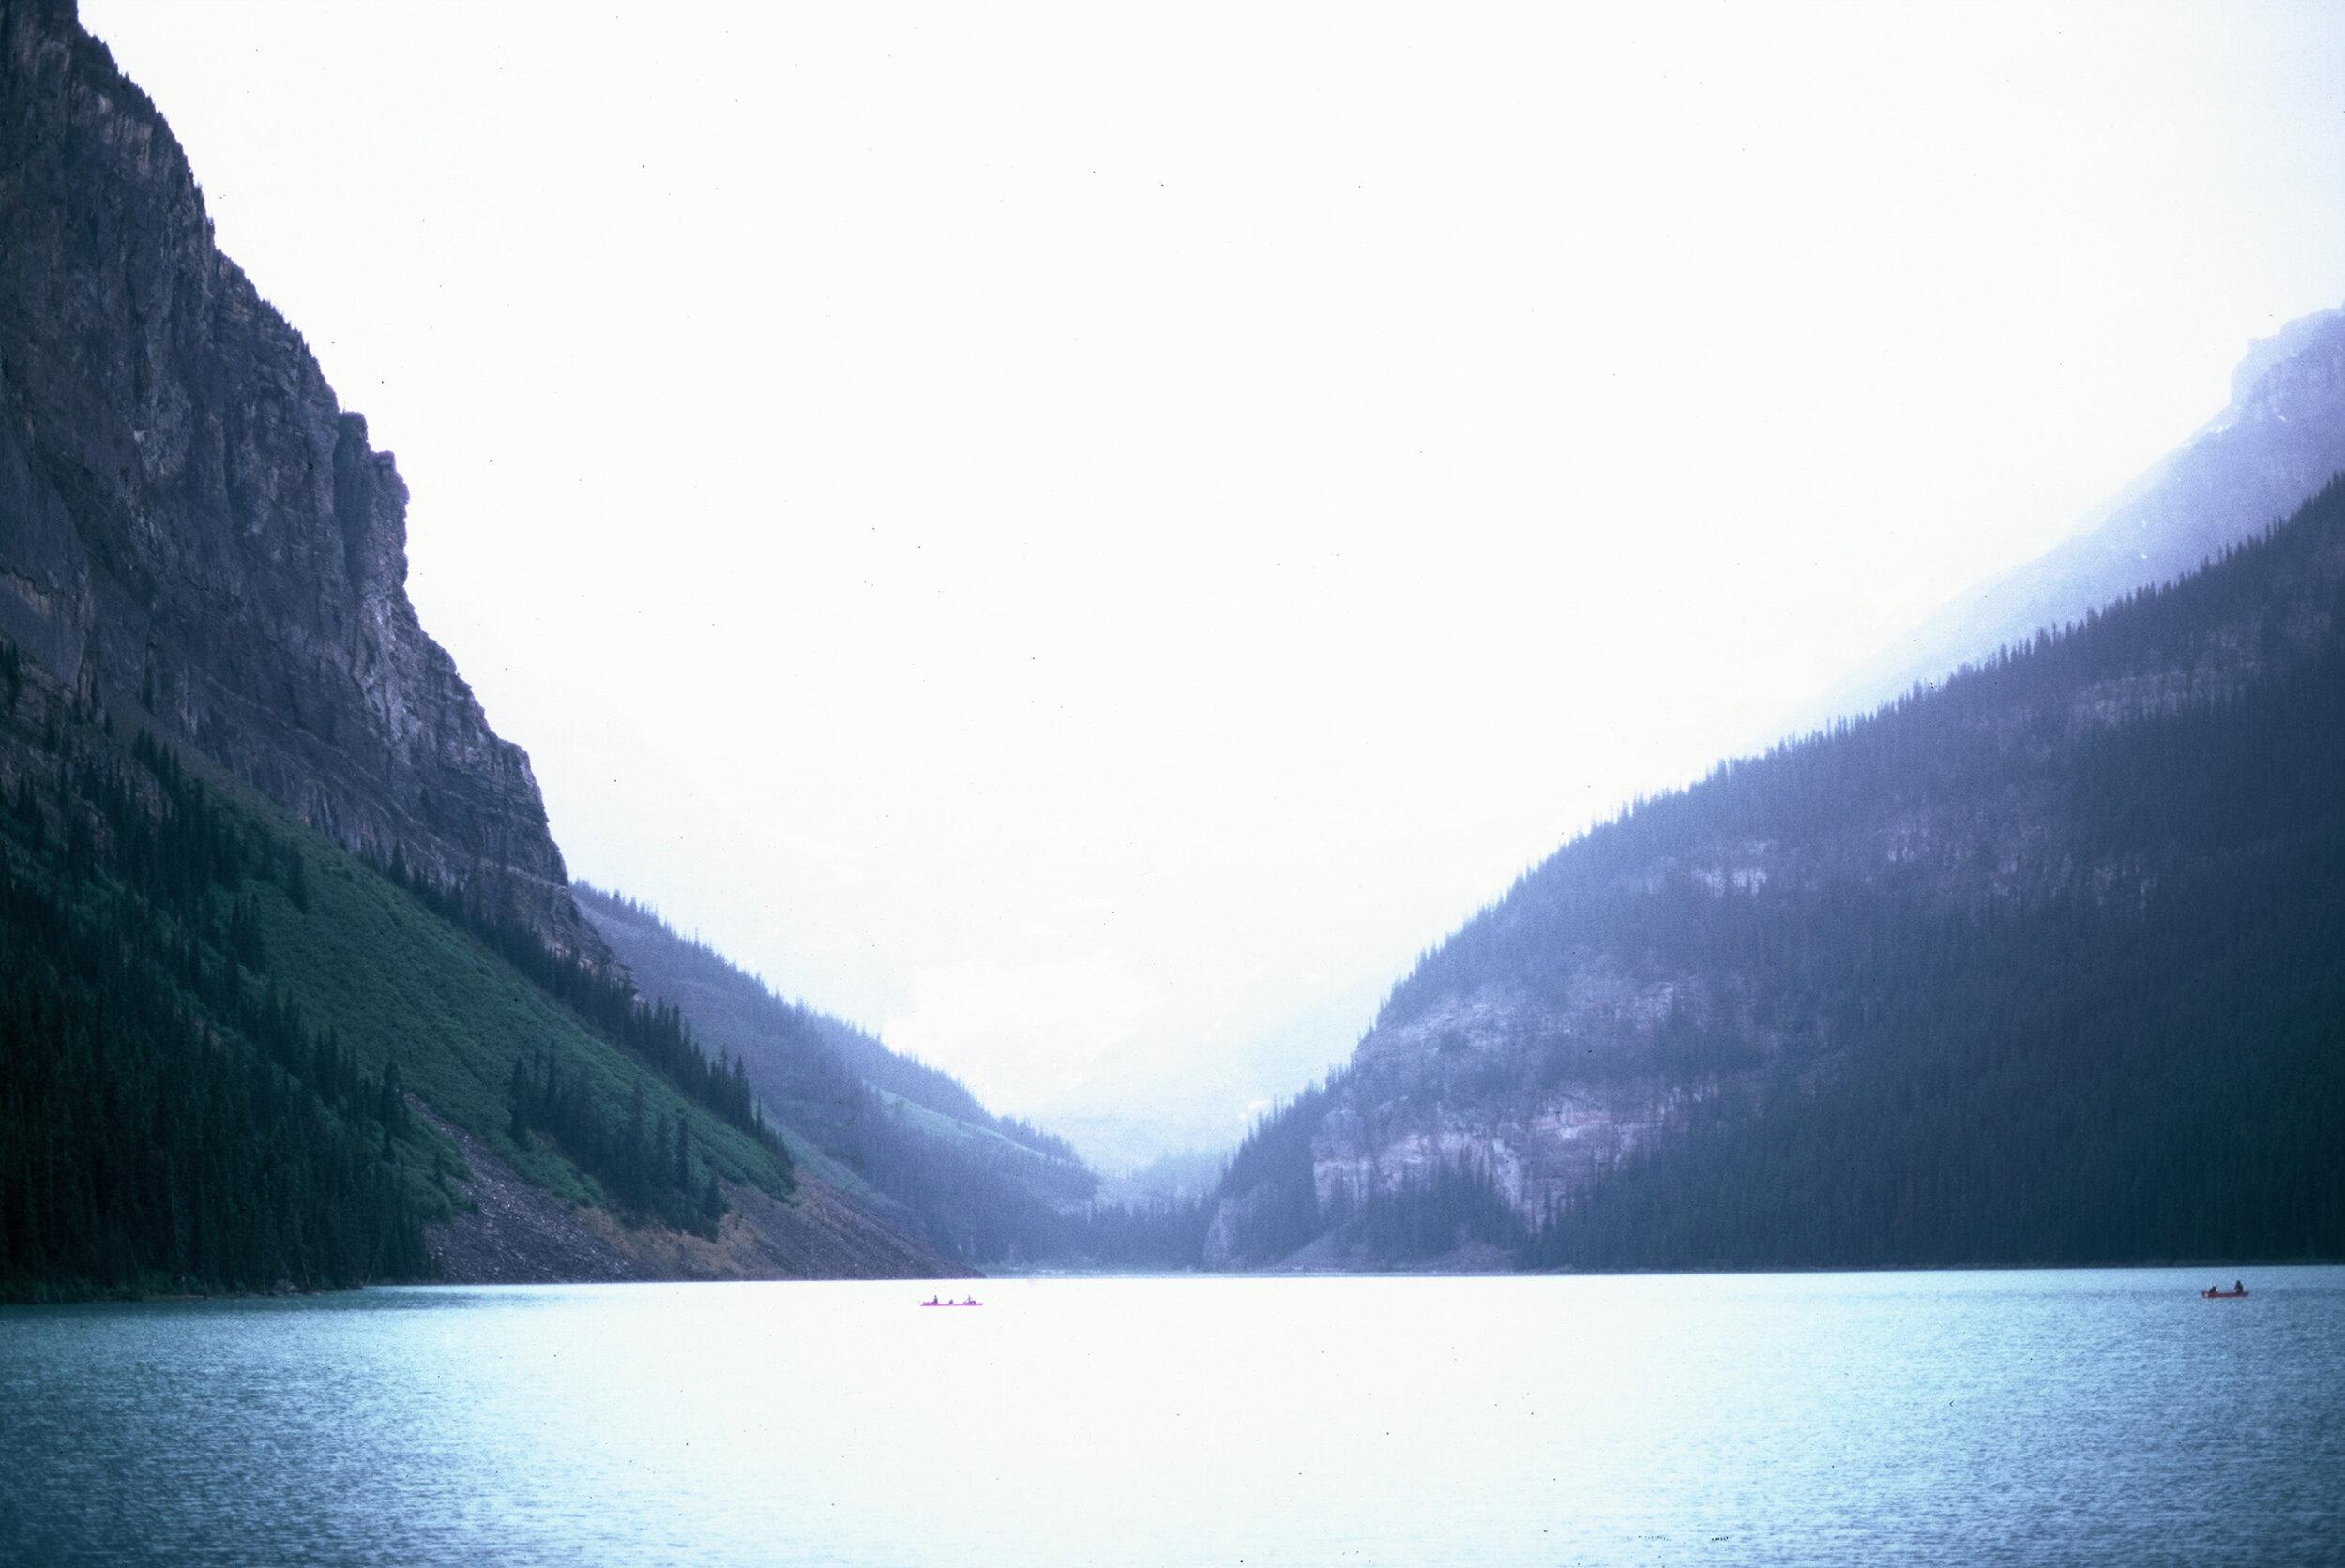 Canadian Rockies Banff Jasper Alberta Mountains 35mm SLR Canon A1 Sample Provia 100f Film Lake Louise